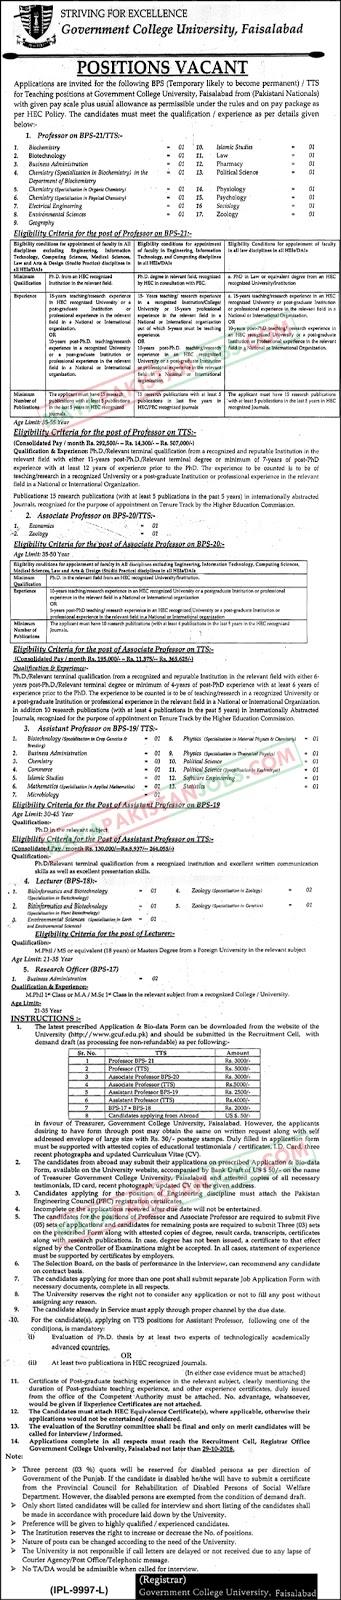 Latest Vacancies Announced in gcuf.edu.pk Govt College University Faisalabad GCUF - 11 October 2018 - Naya Pakistan